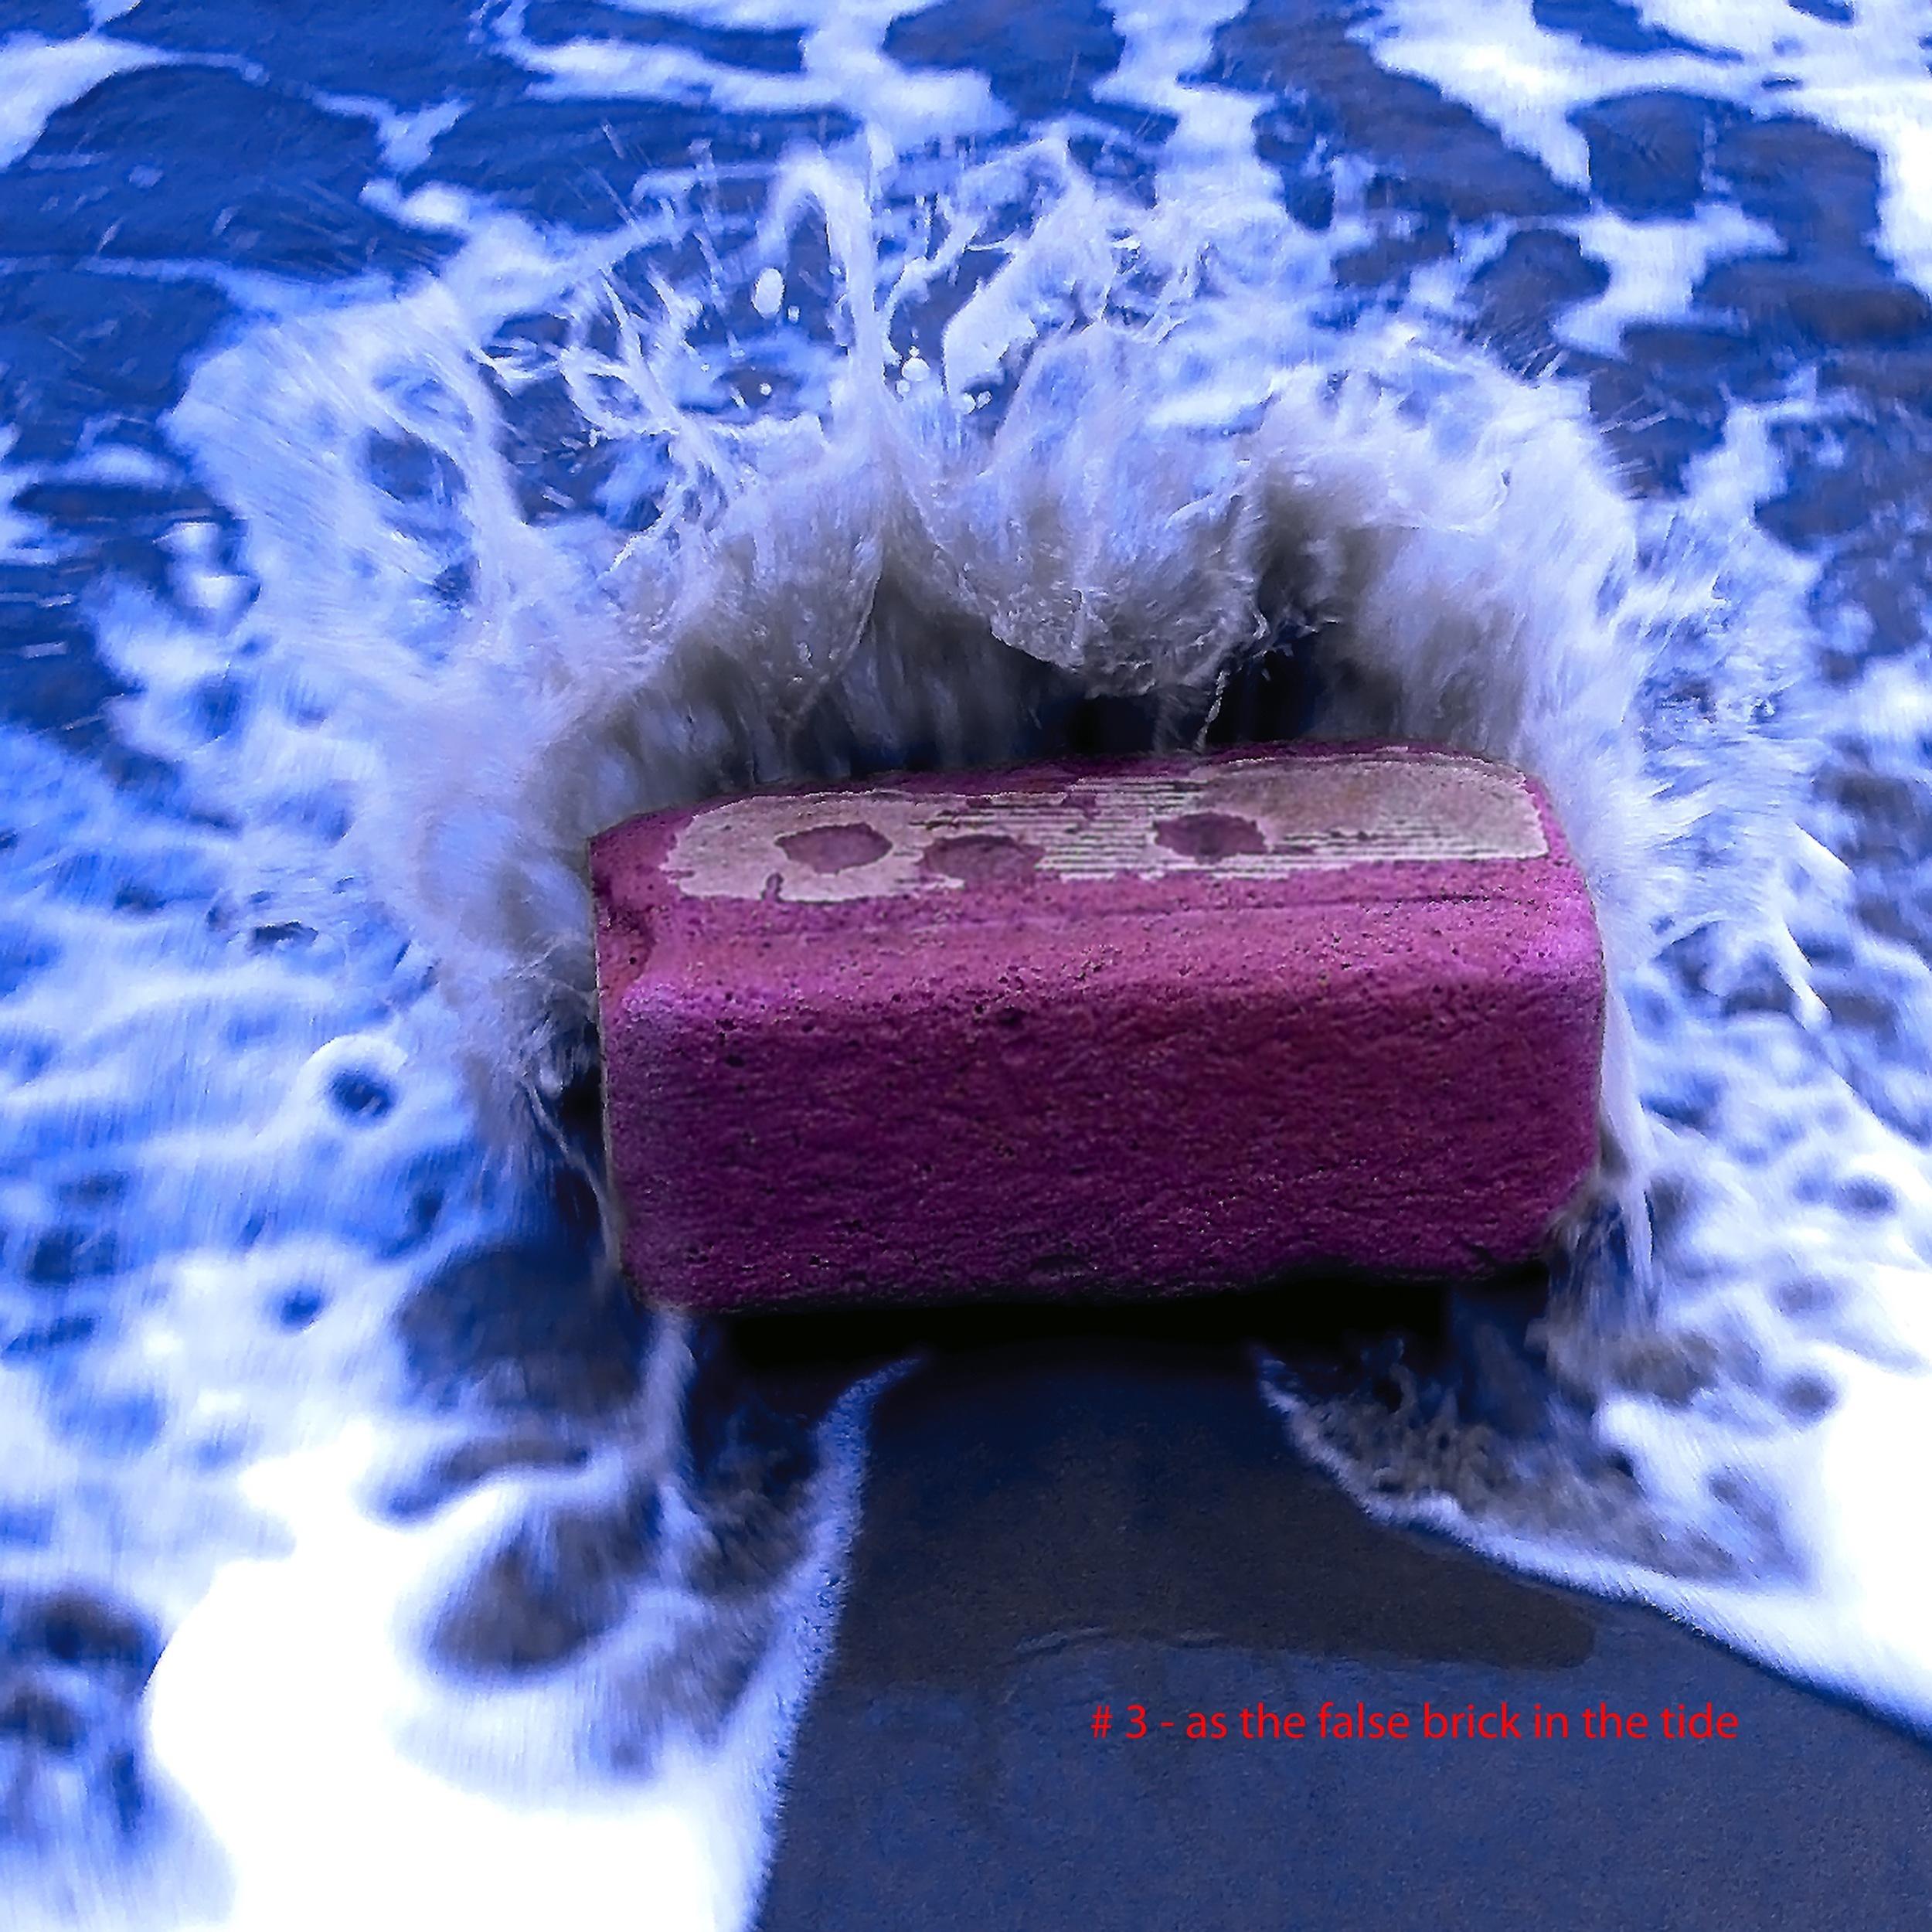 #3 - Brick tide tif.jpg